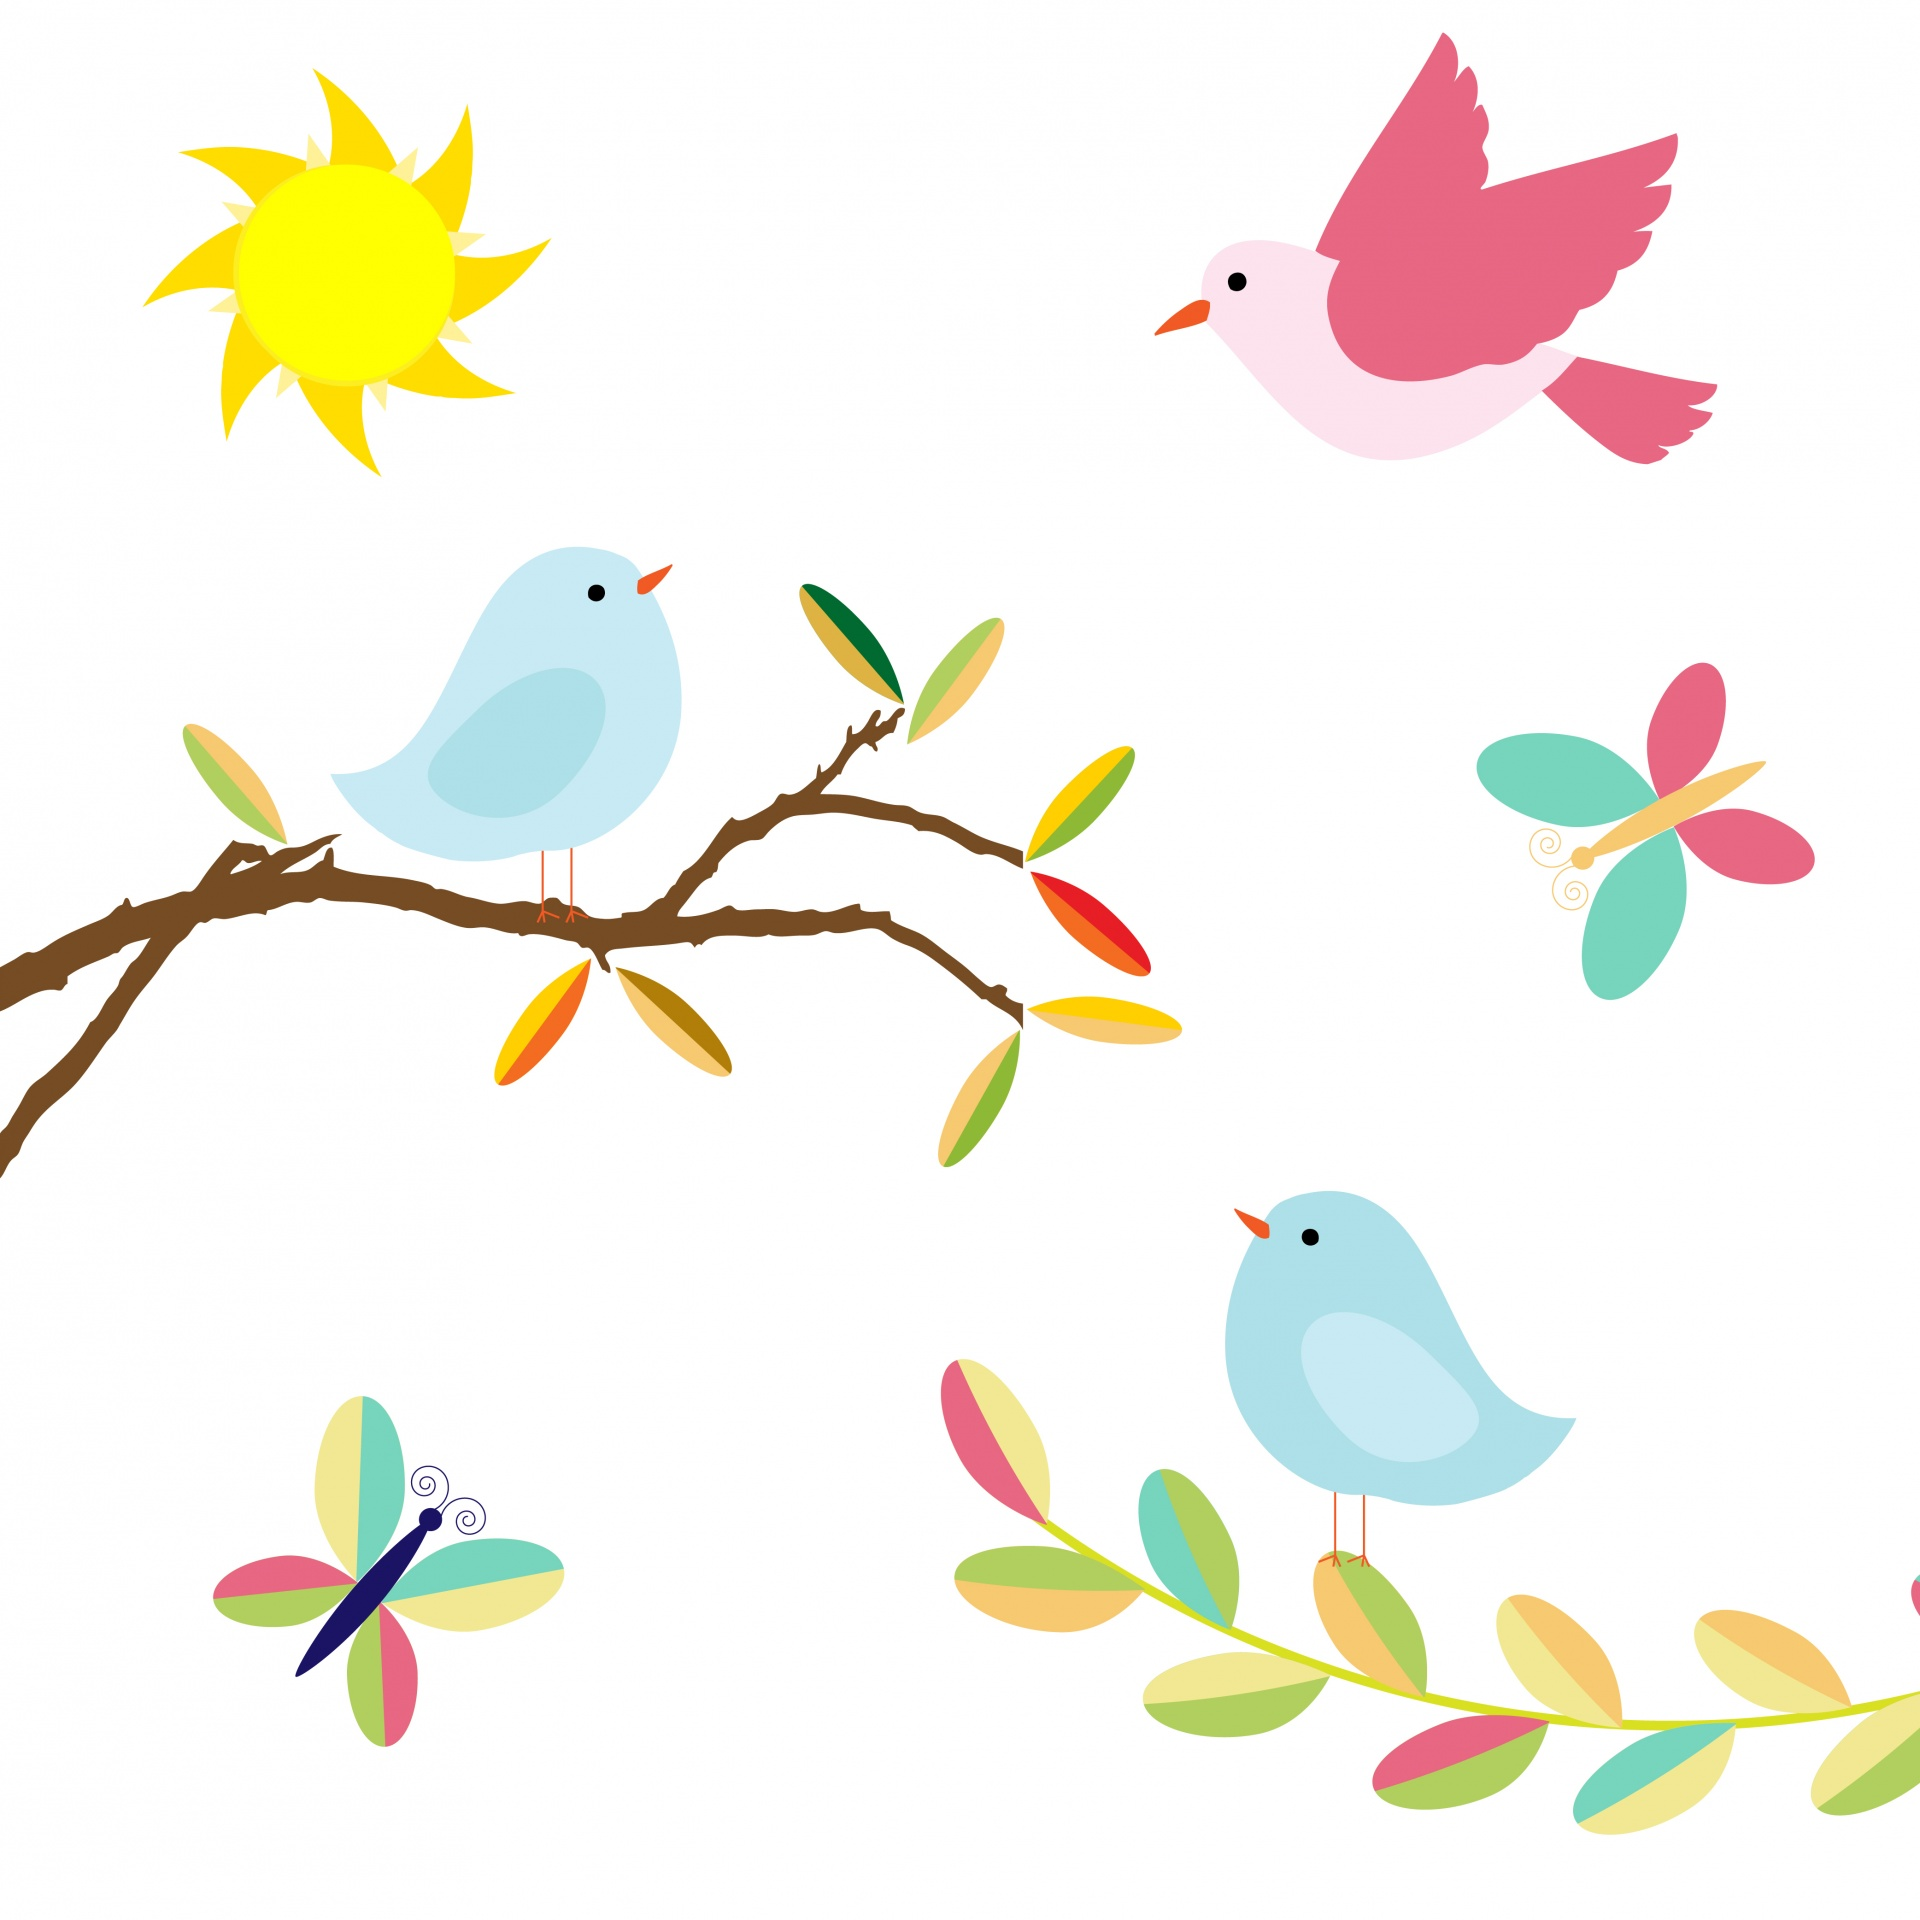 Clipart birds. Illustration free stock photo